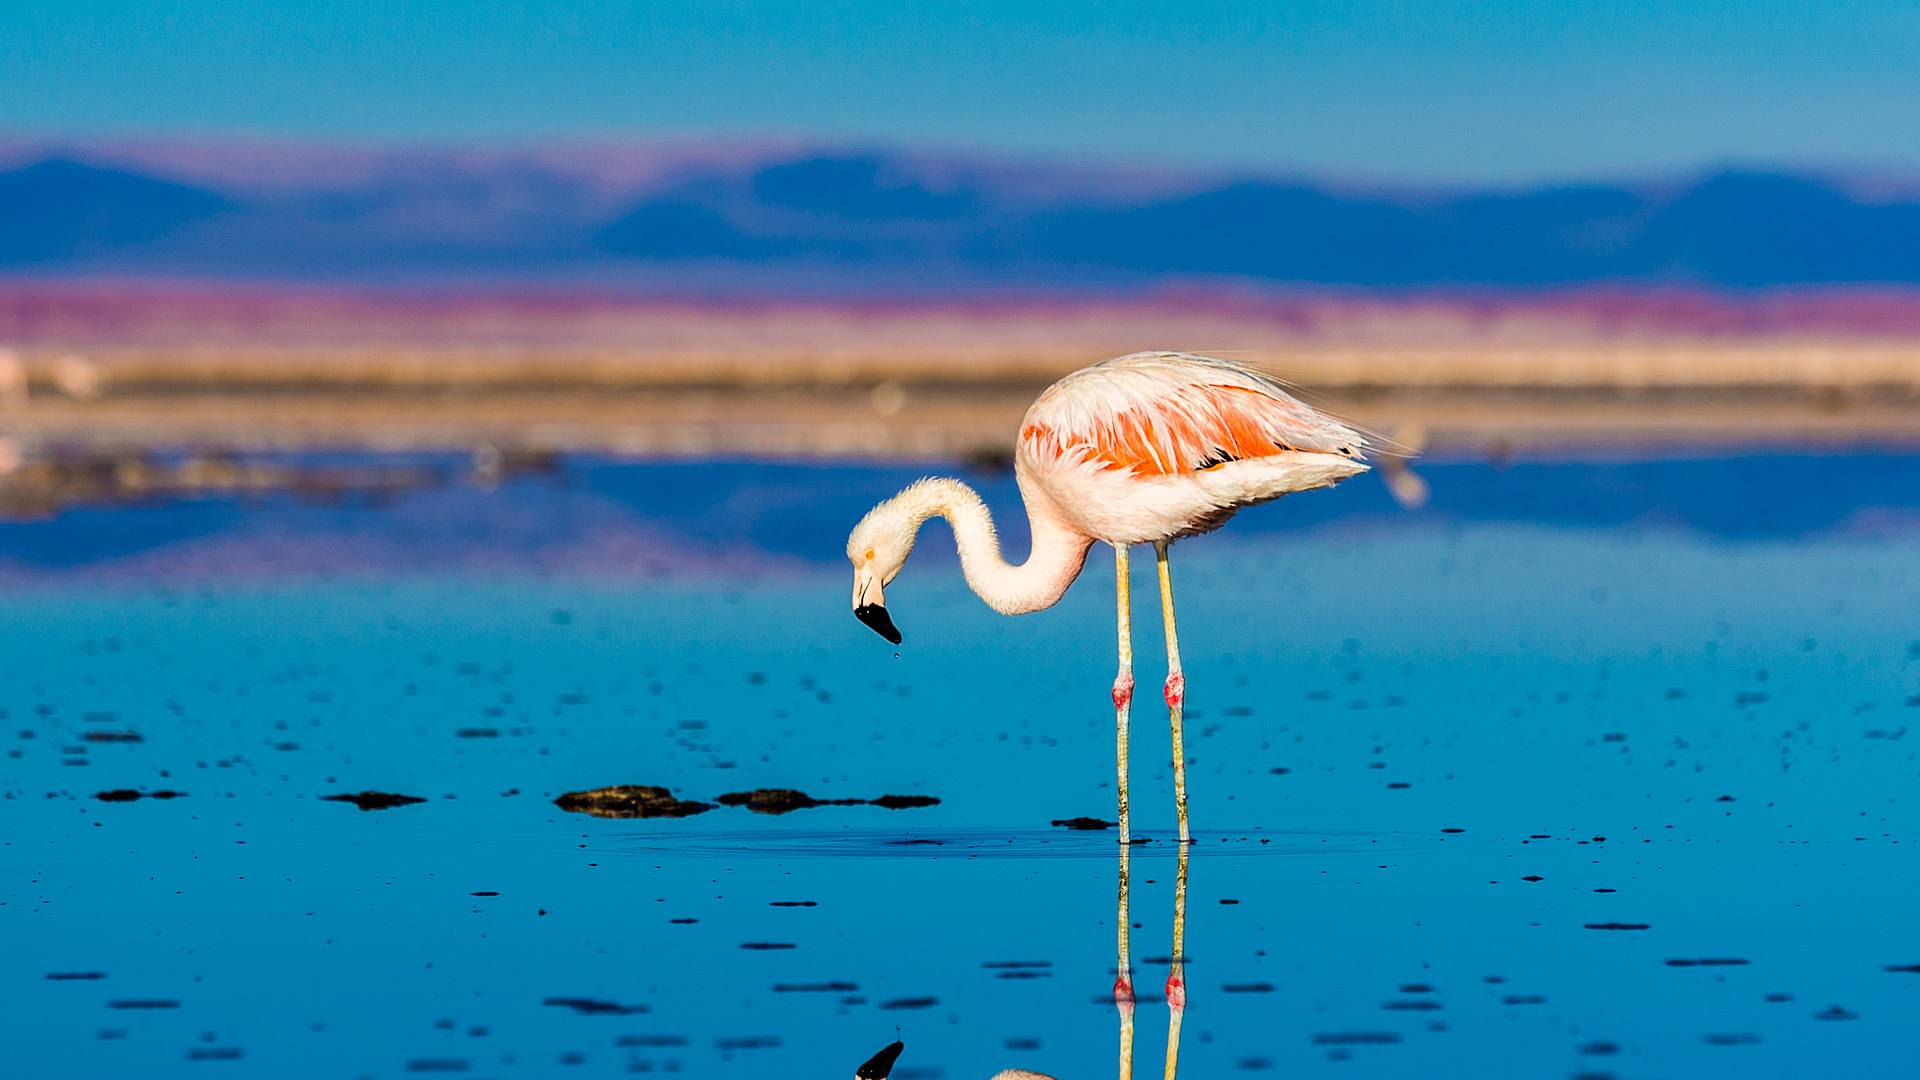 Atacama, Patagonia e Isola di Pasqua